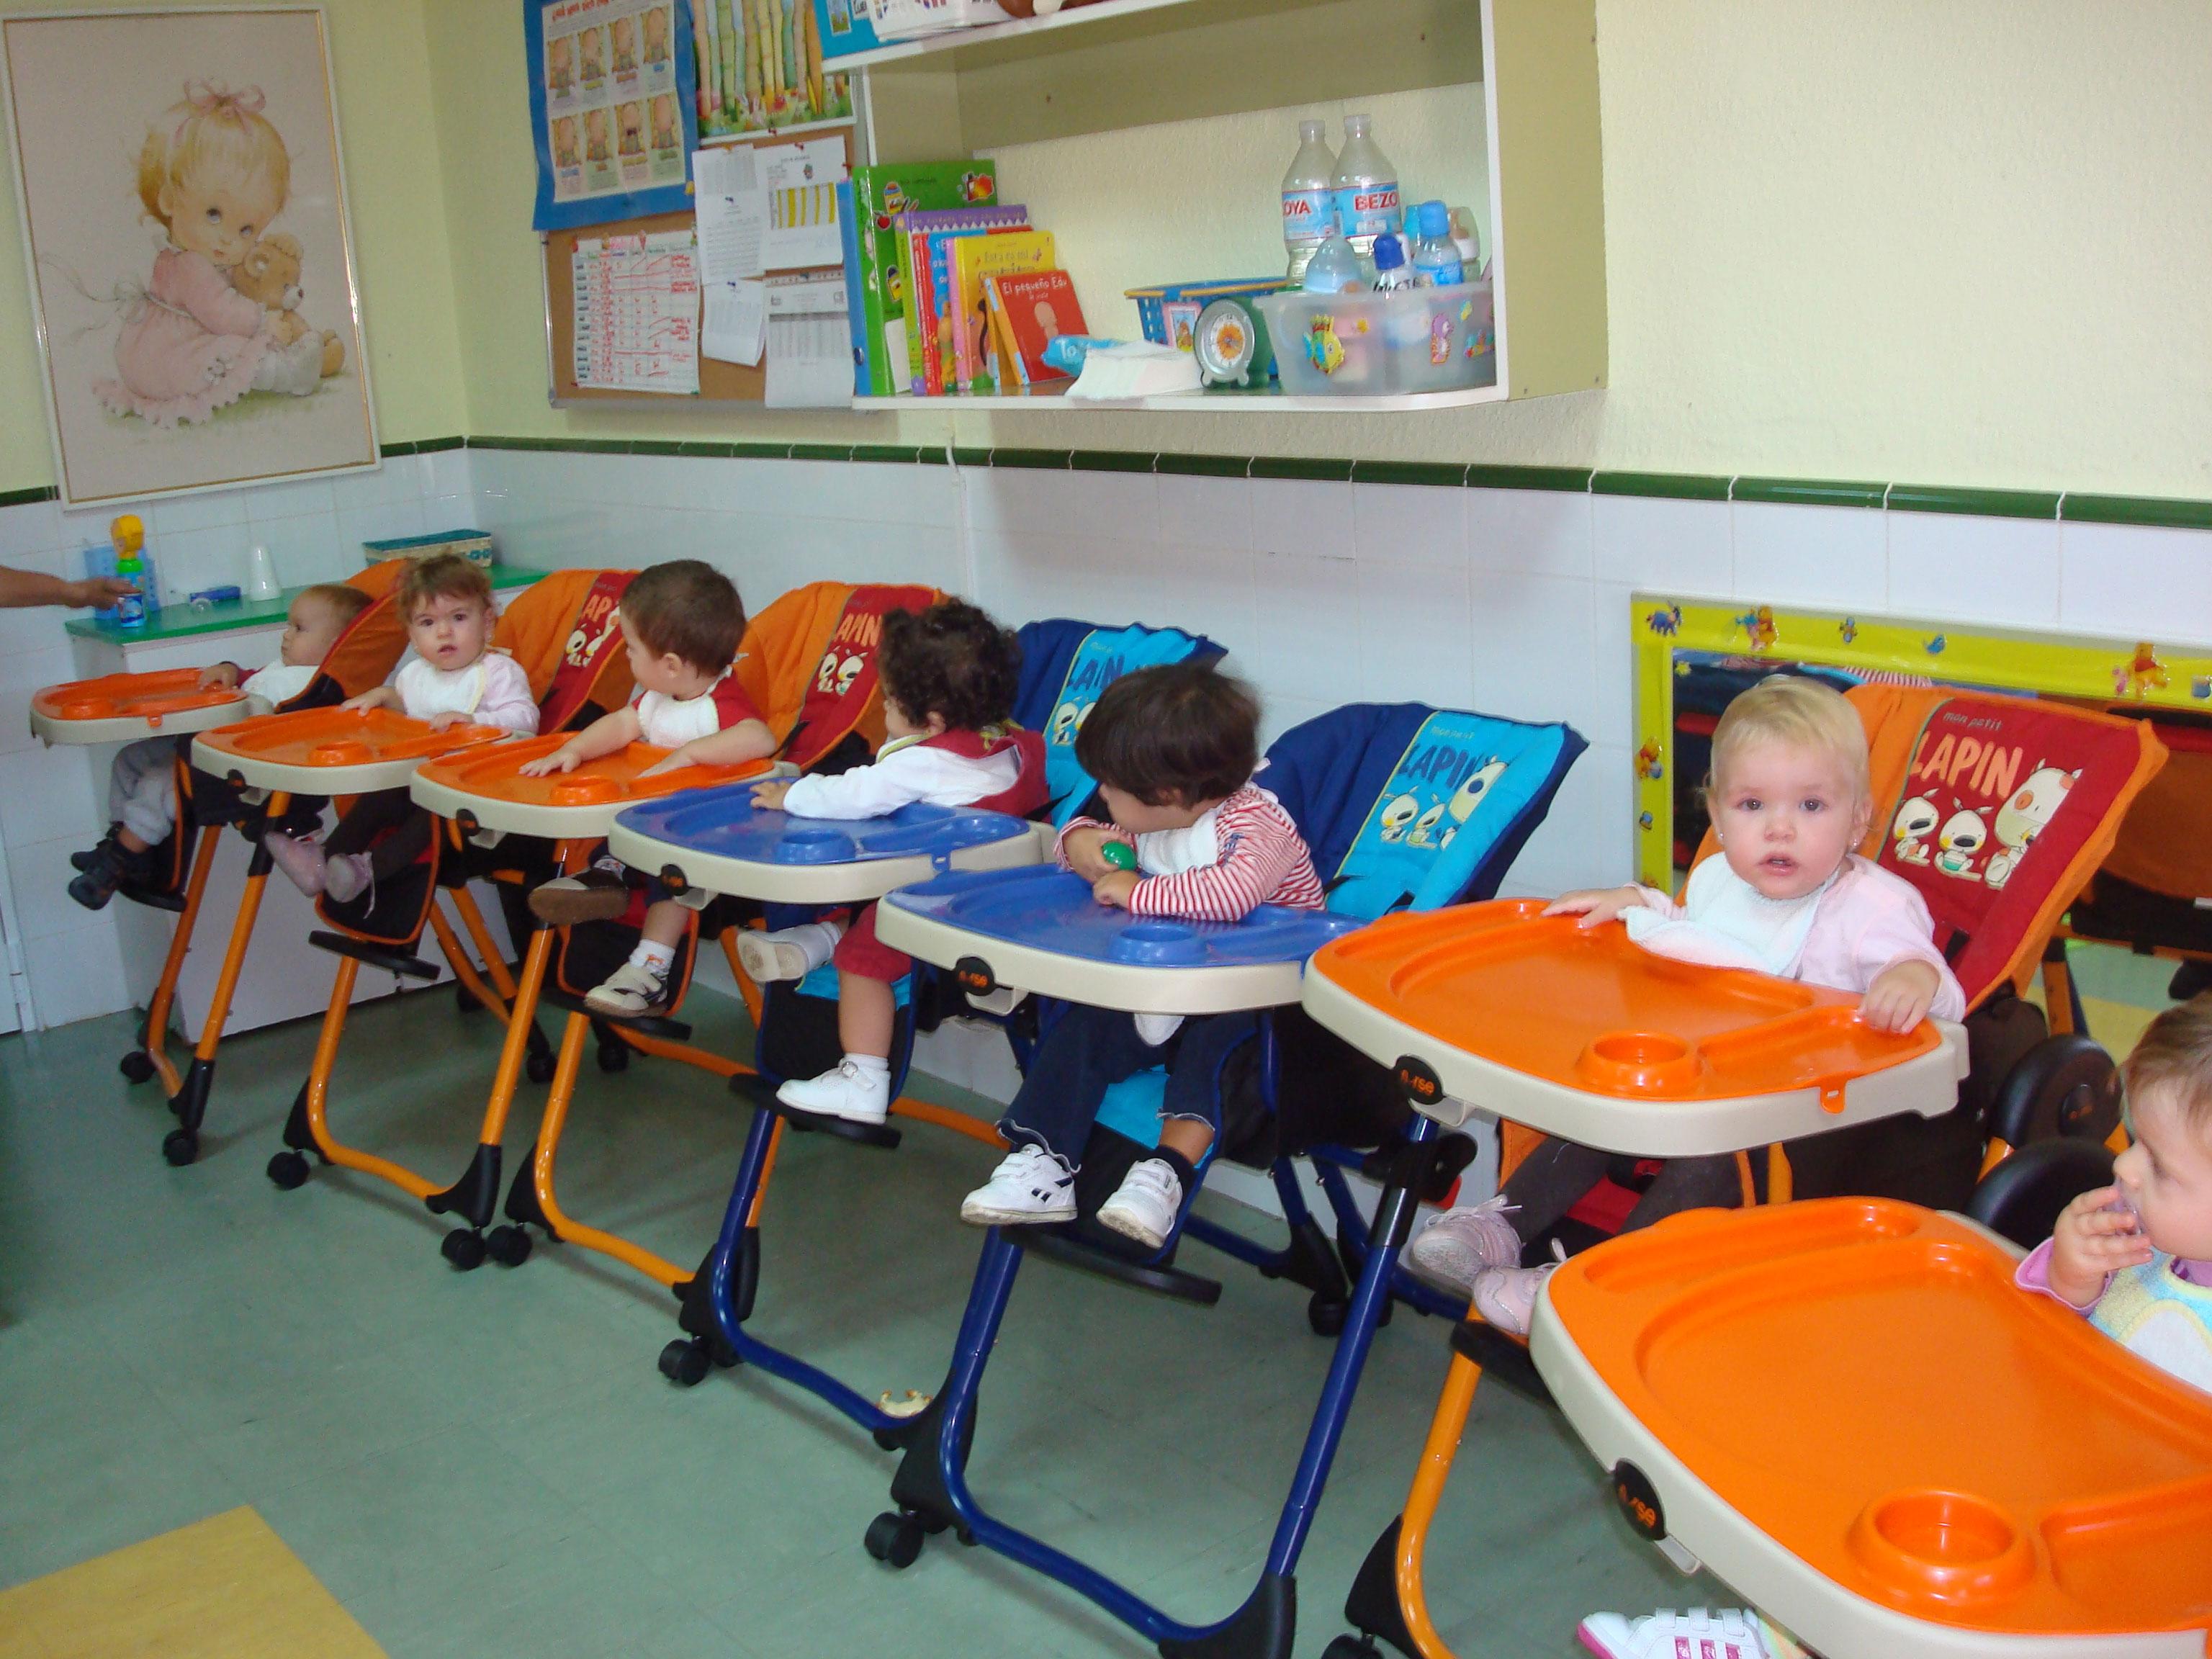 Escuela infantil municipal virgen de la caridad centros for Comedor infantil